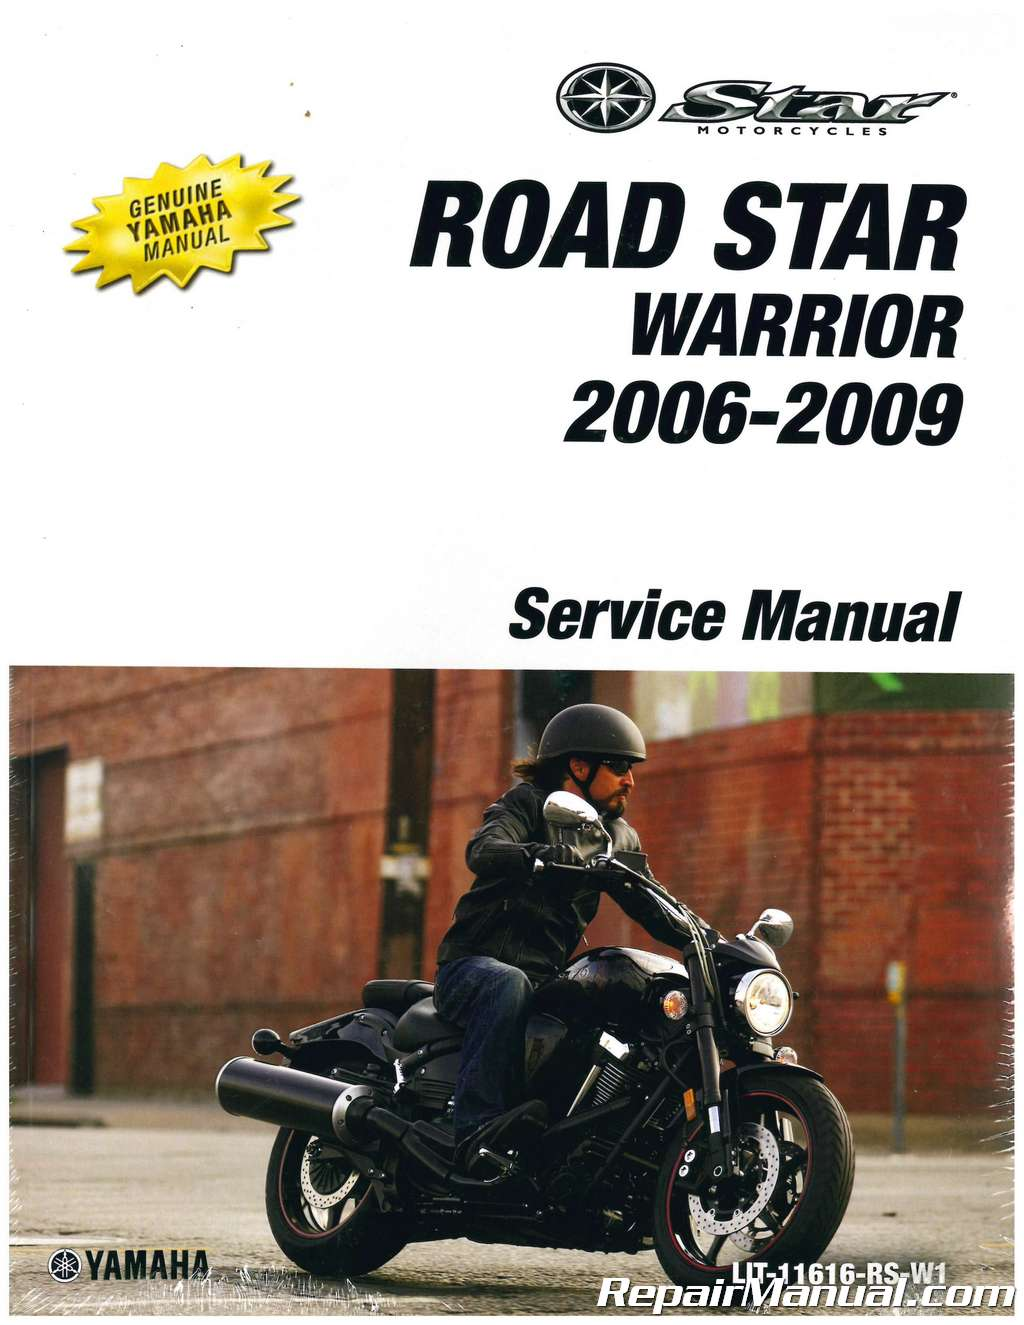 2006 2009 yamaha xv17 road star warrior motorcycle service manual rh repairmanual com yamaha road star shop manual yamaha road star owners manual